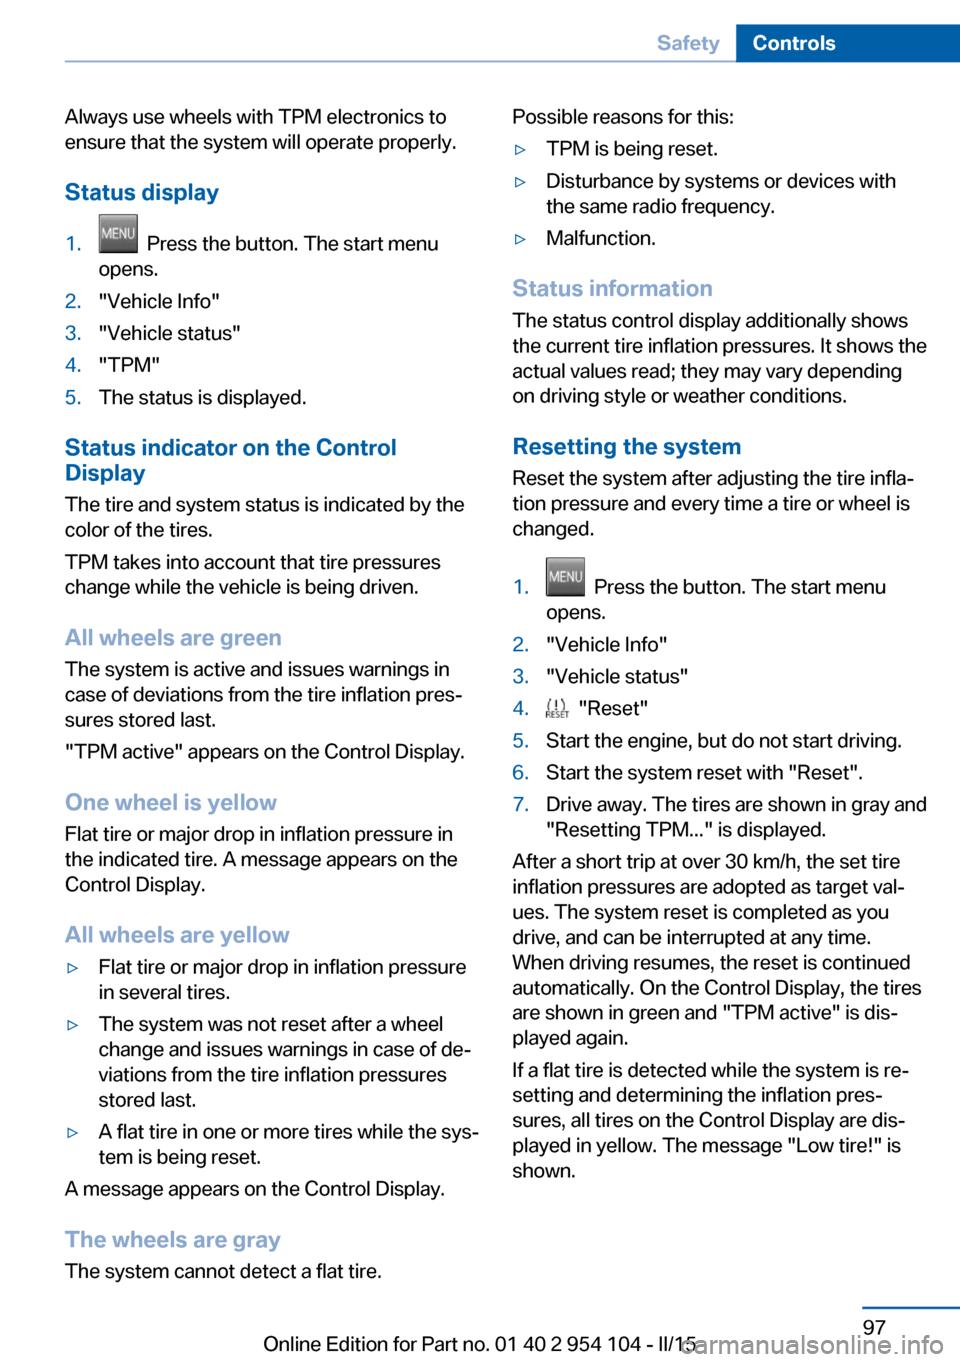 Bmw Z4 2015 E89 Owner S Manual